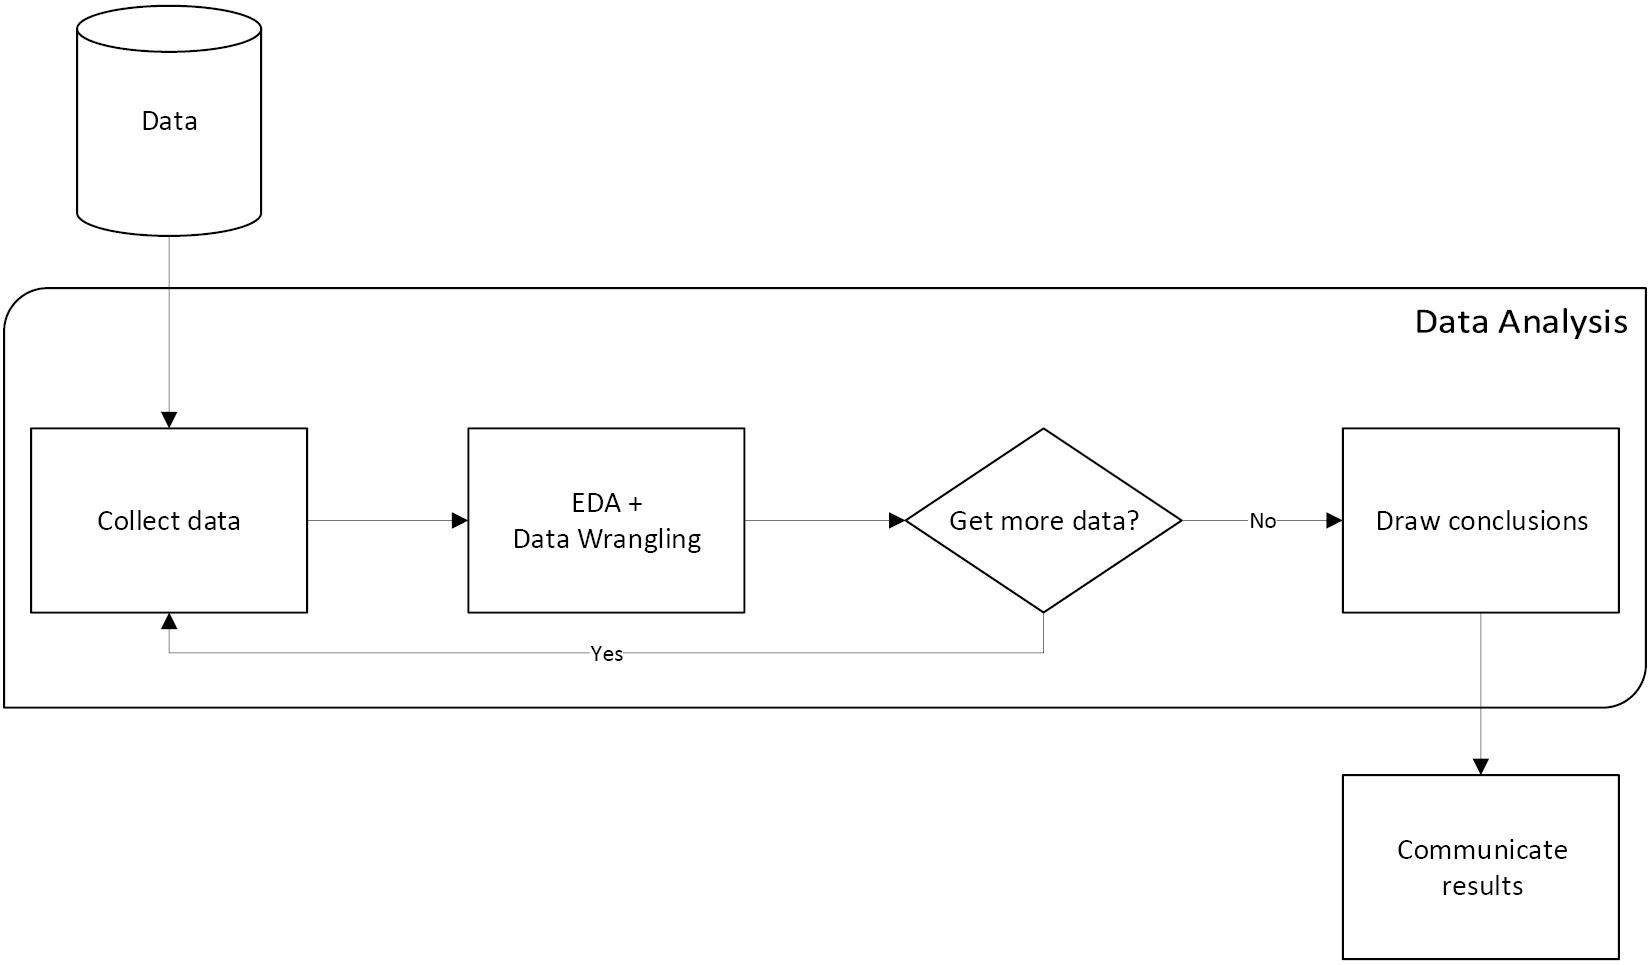 Figure 1.2 – The data analysis workflow